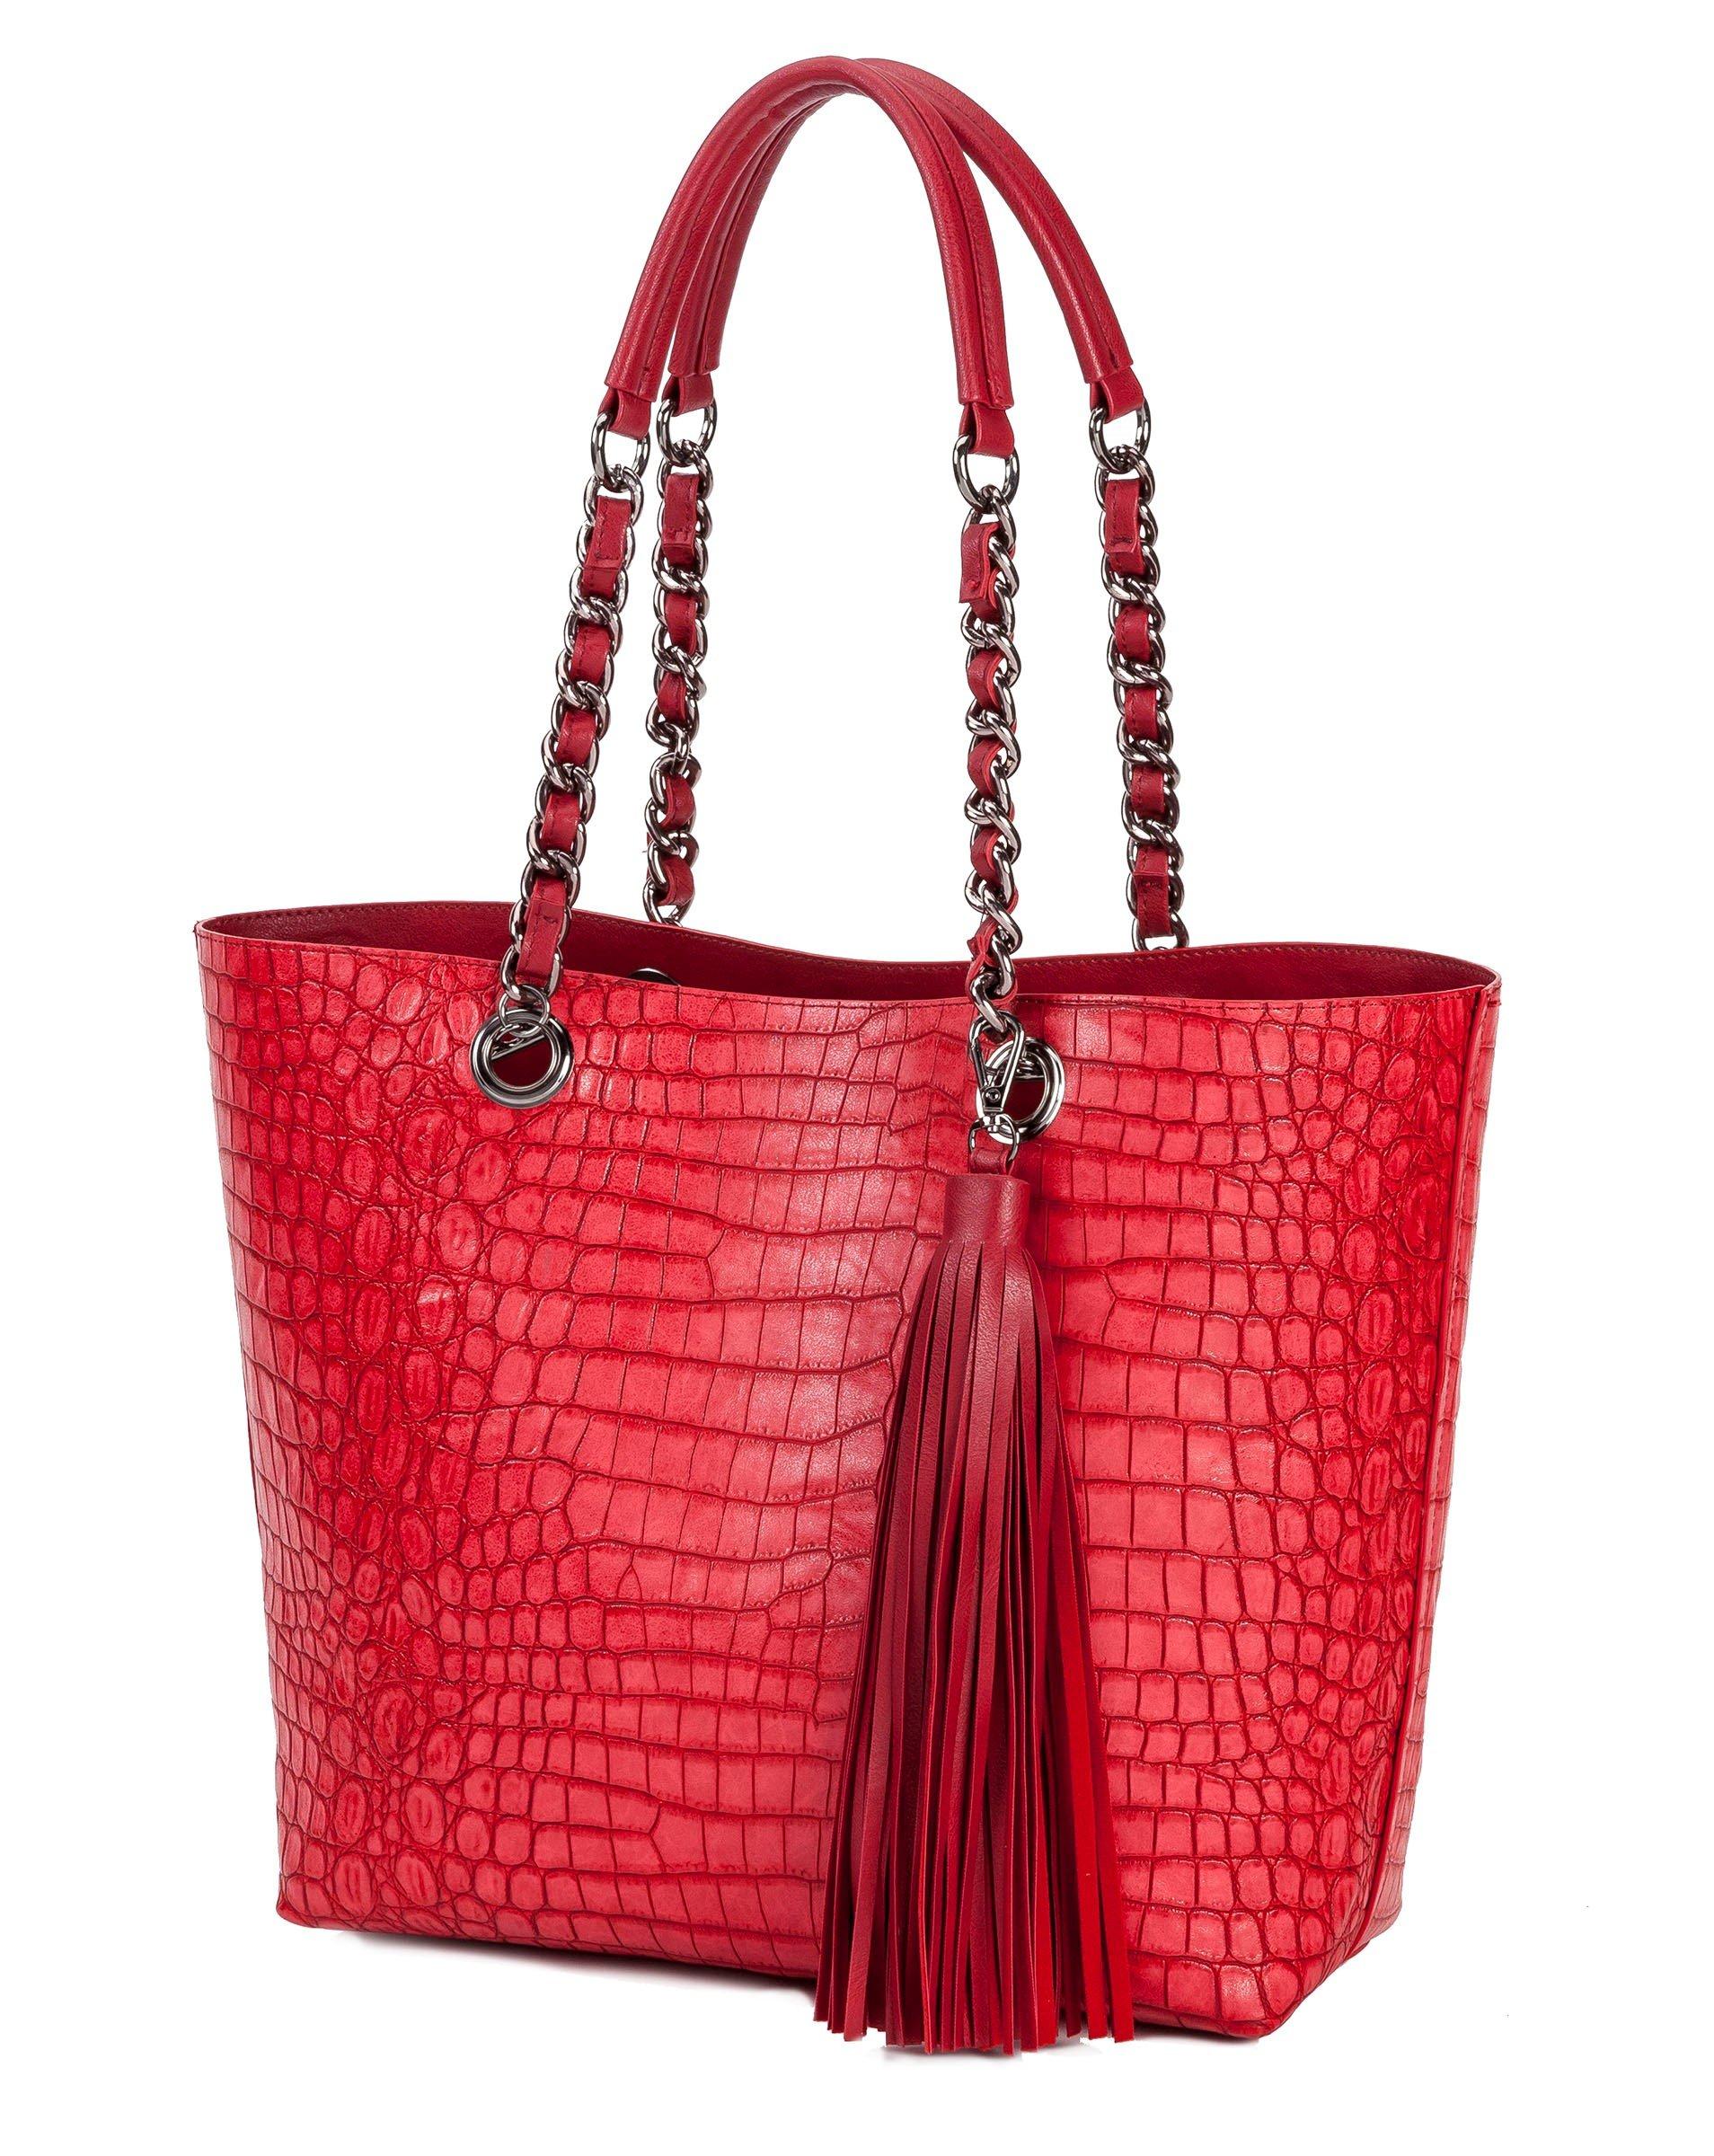 Sydney Love Reversible Tote Bag Crocodile